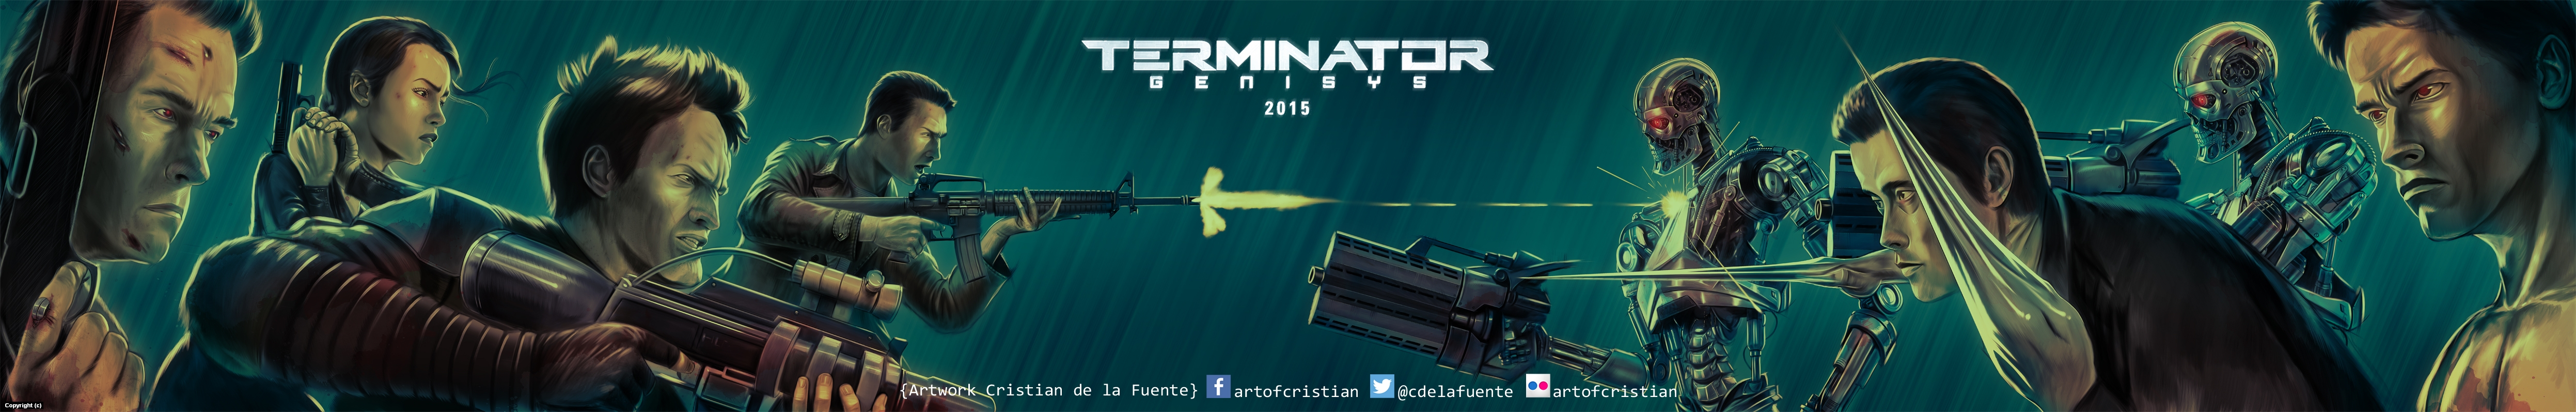 Terminator Genisys banner Poster Artwork by Cristian  De la fuente